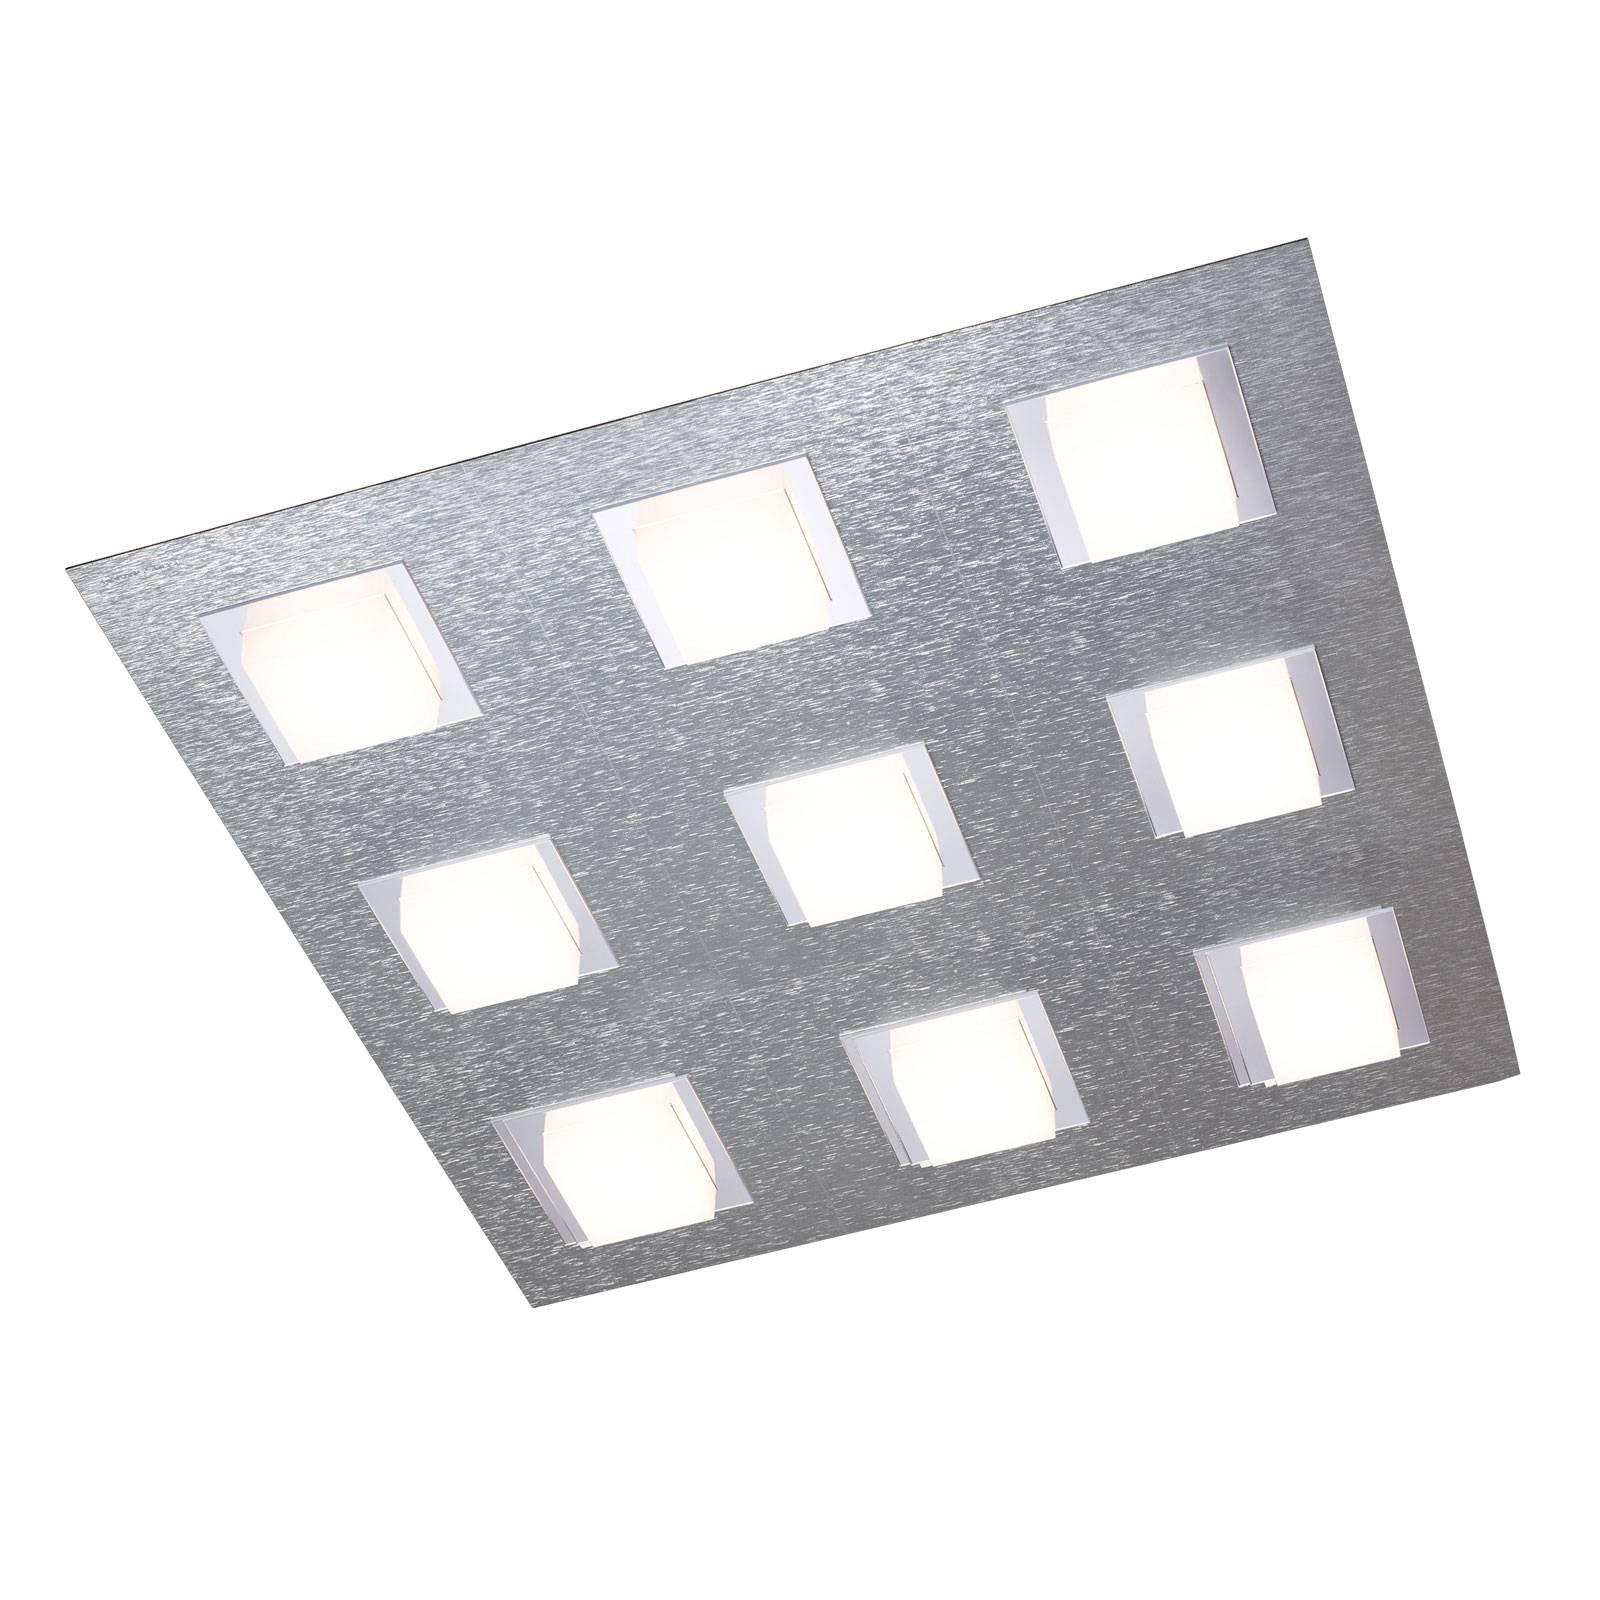 GROSSMANN Basic taklampe, 9 lyskilder, aluminium